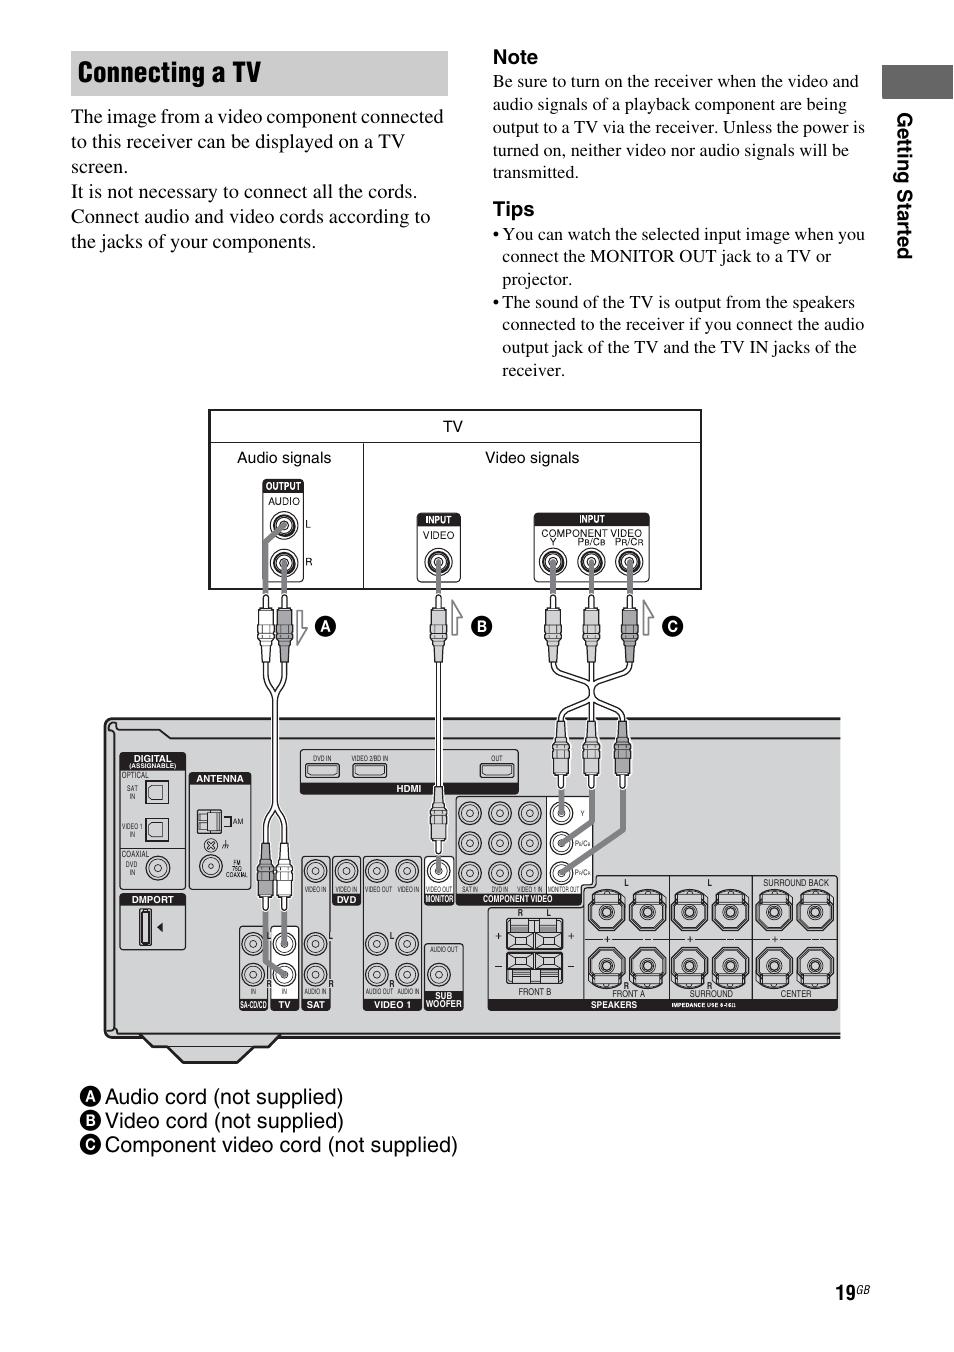 age 19 23 connecting a tv tips sony multi channel av receiver rh manualsdir com Sony STR- DG510 Receiver sony str dg710 manual pdf